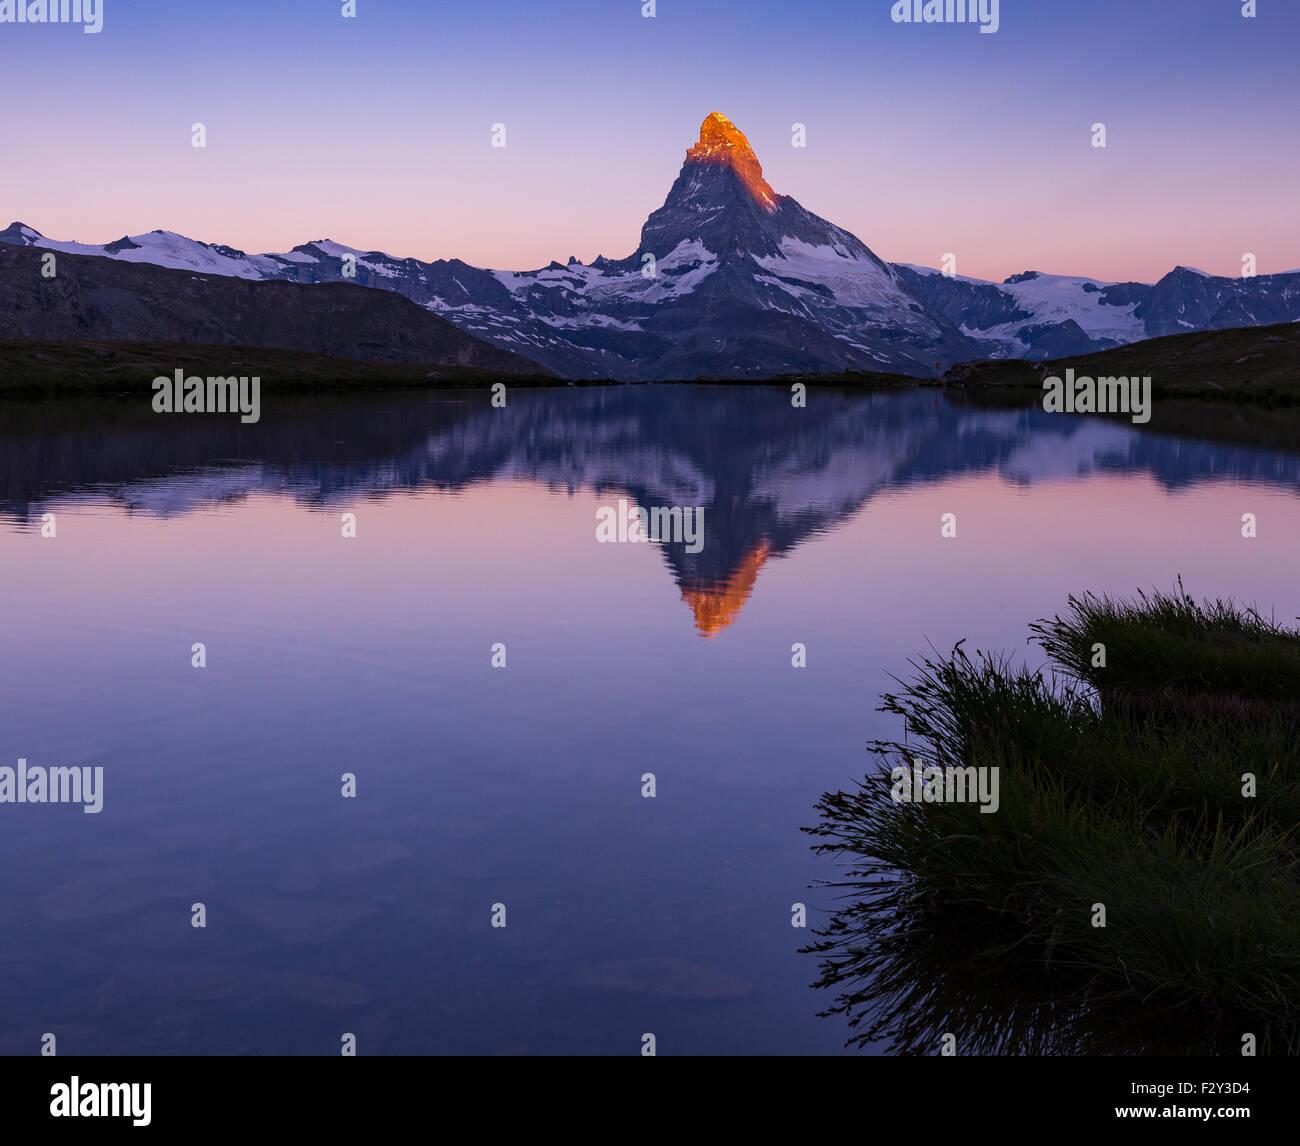 Sonnenaufgang am Mt.Matterhorn (Cervino).  Lake Stellisee, Zermatt, Schweiz Stockbild